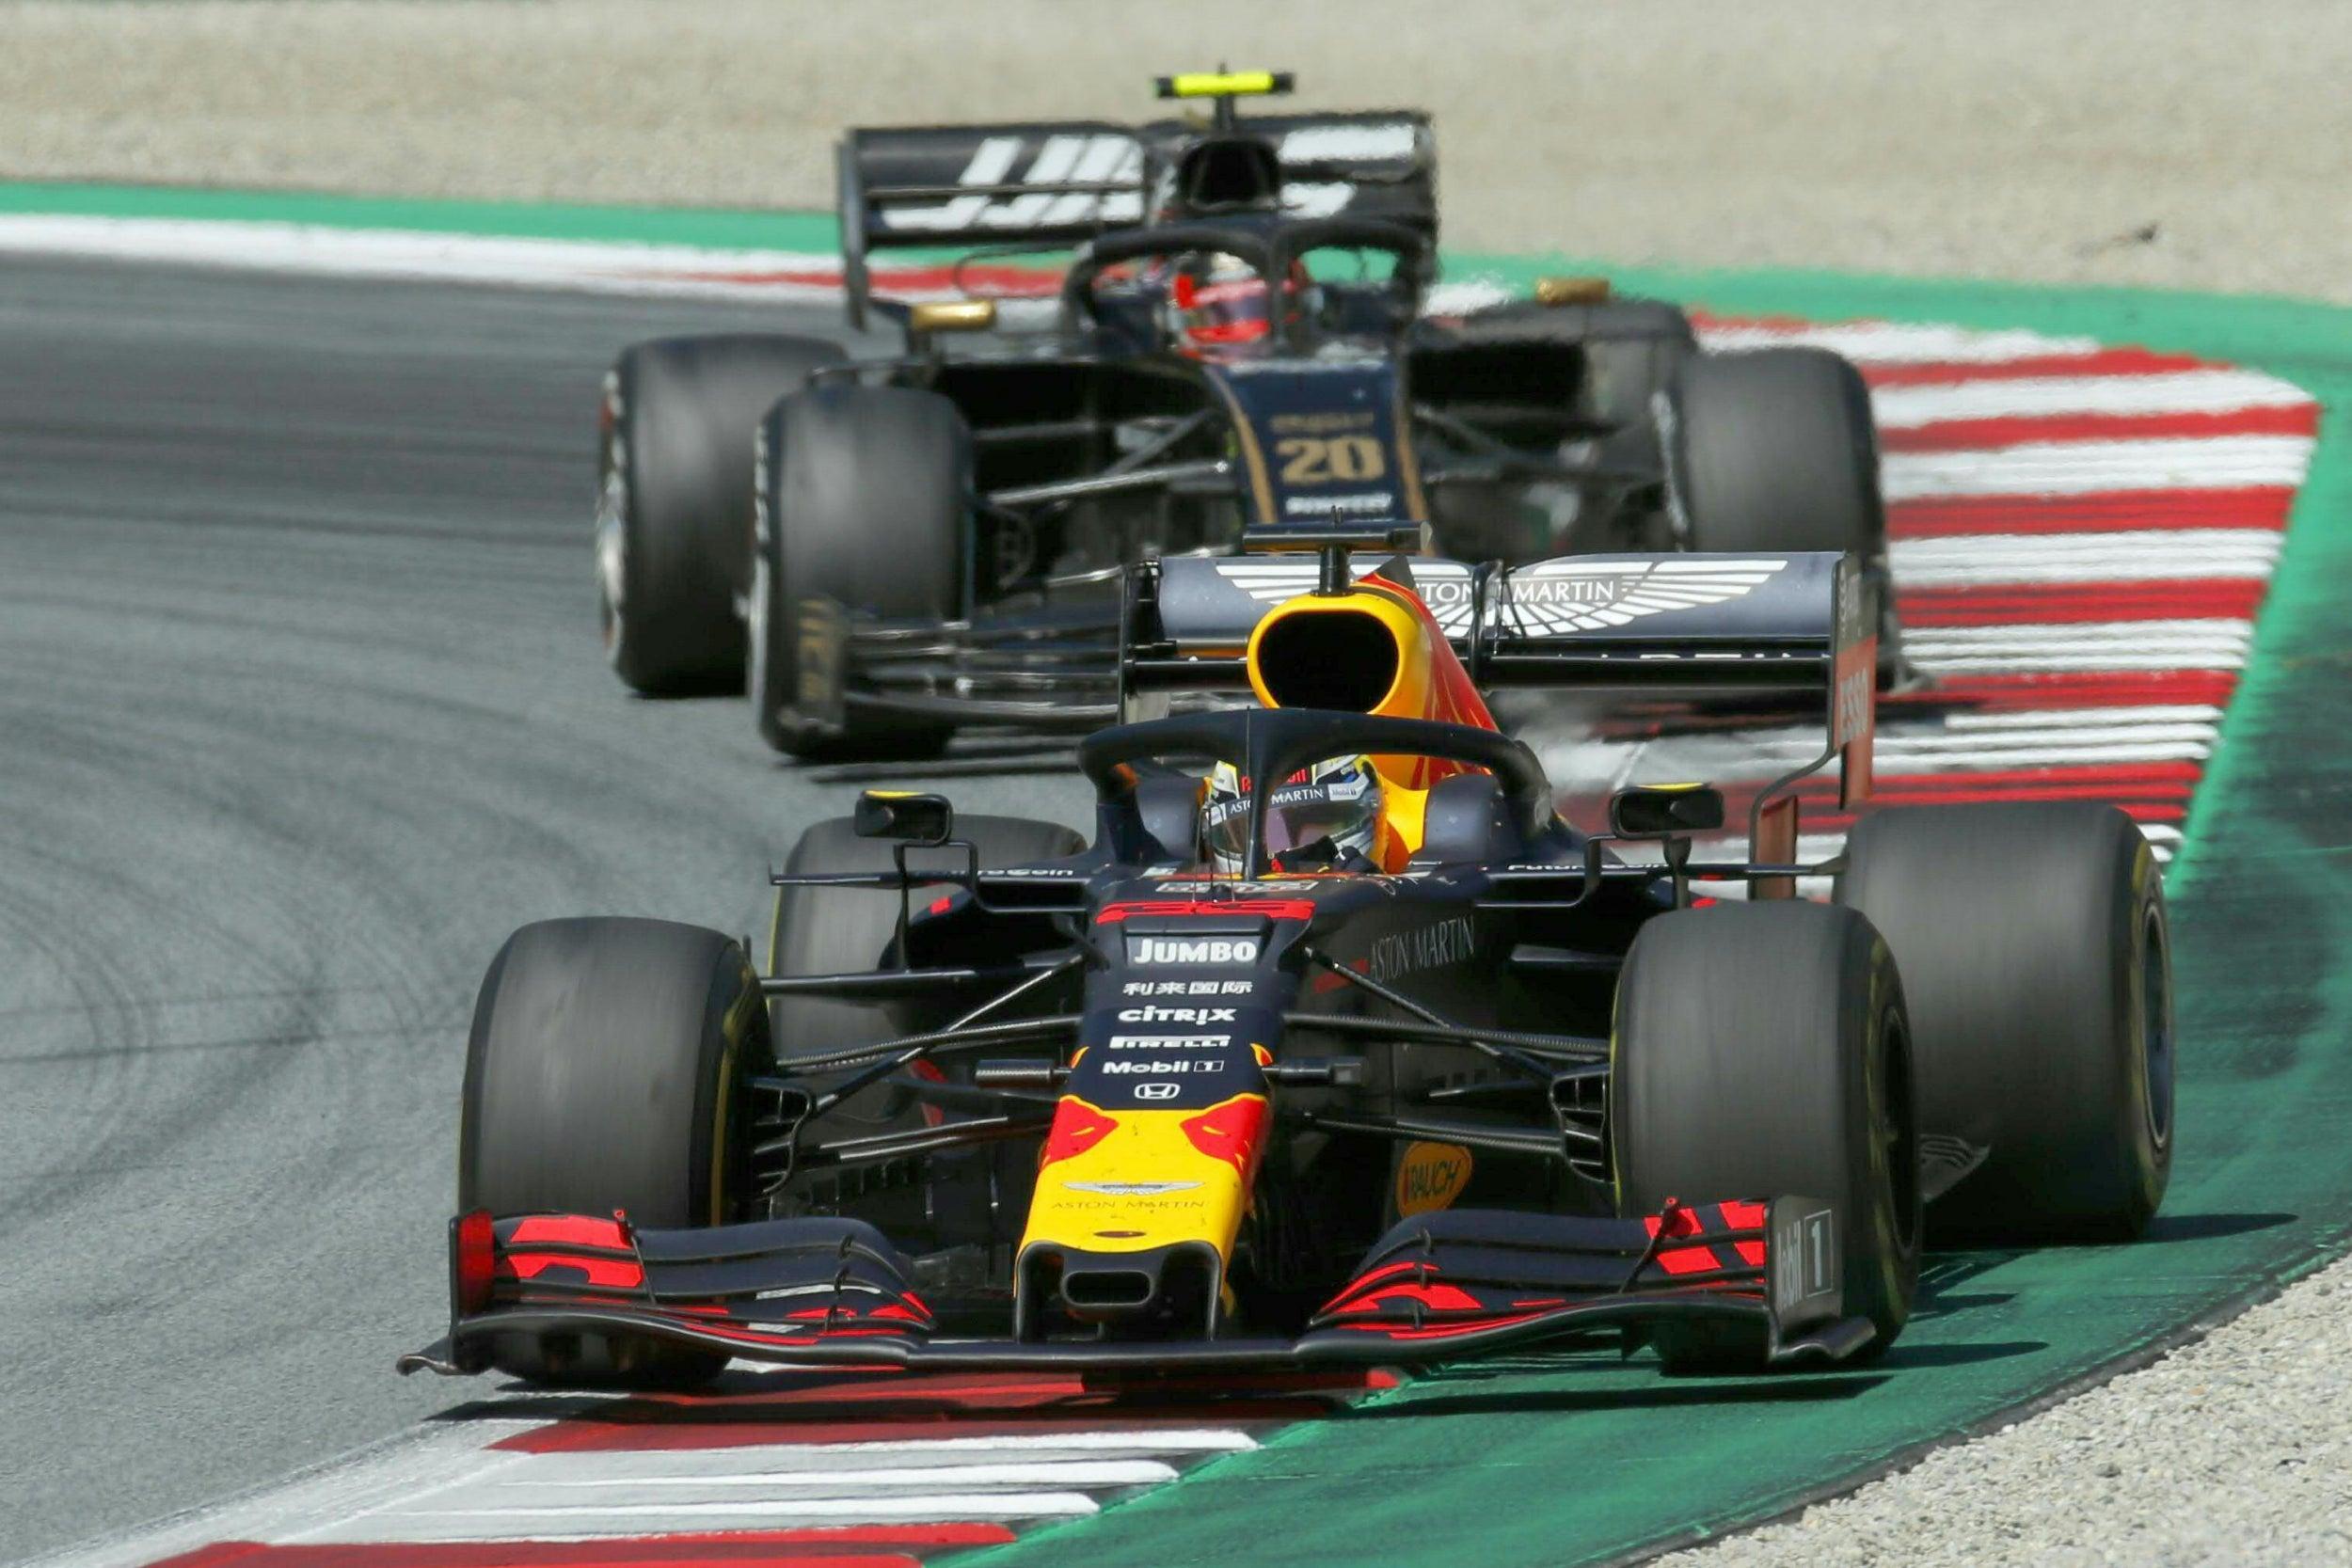 Coronavirus: Austria gives go-ahead to crowd-free Formula 1 races